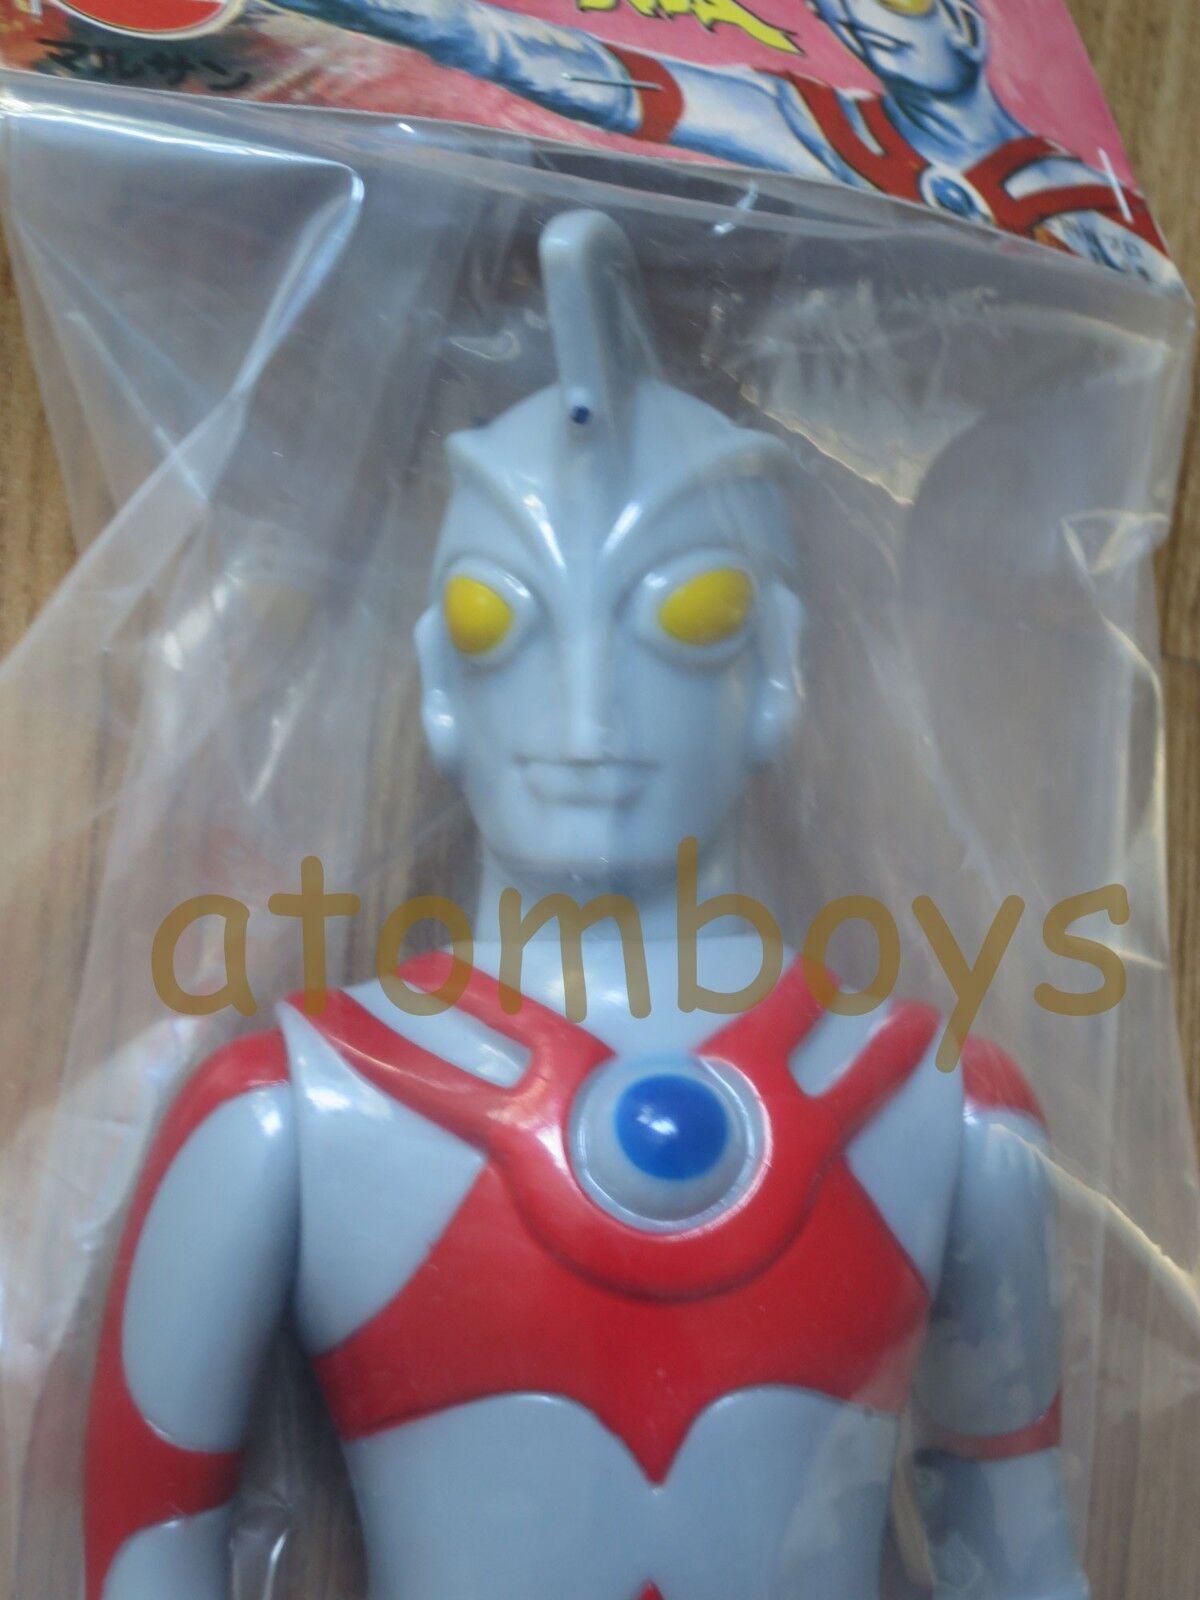 Marusan San Ultrauomo Ultra Ace 450 sofubi soft  vinyl sofvi cifra giocattolo Japan  tutti i beni sono speciali